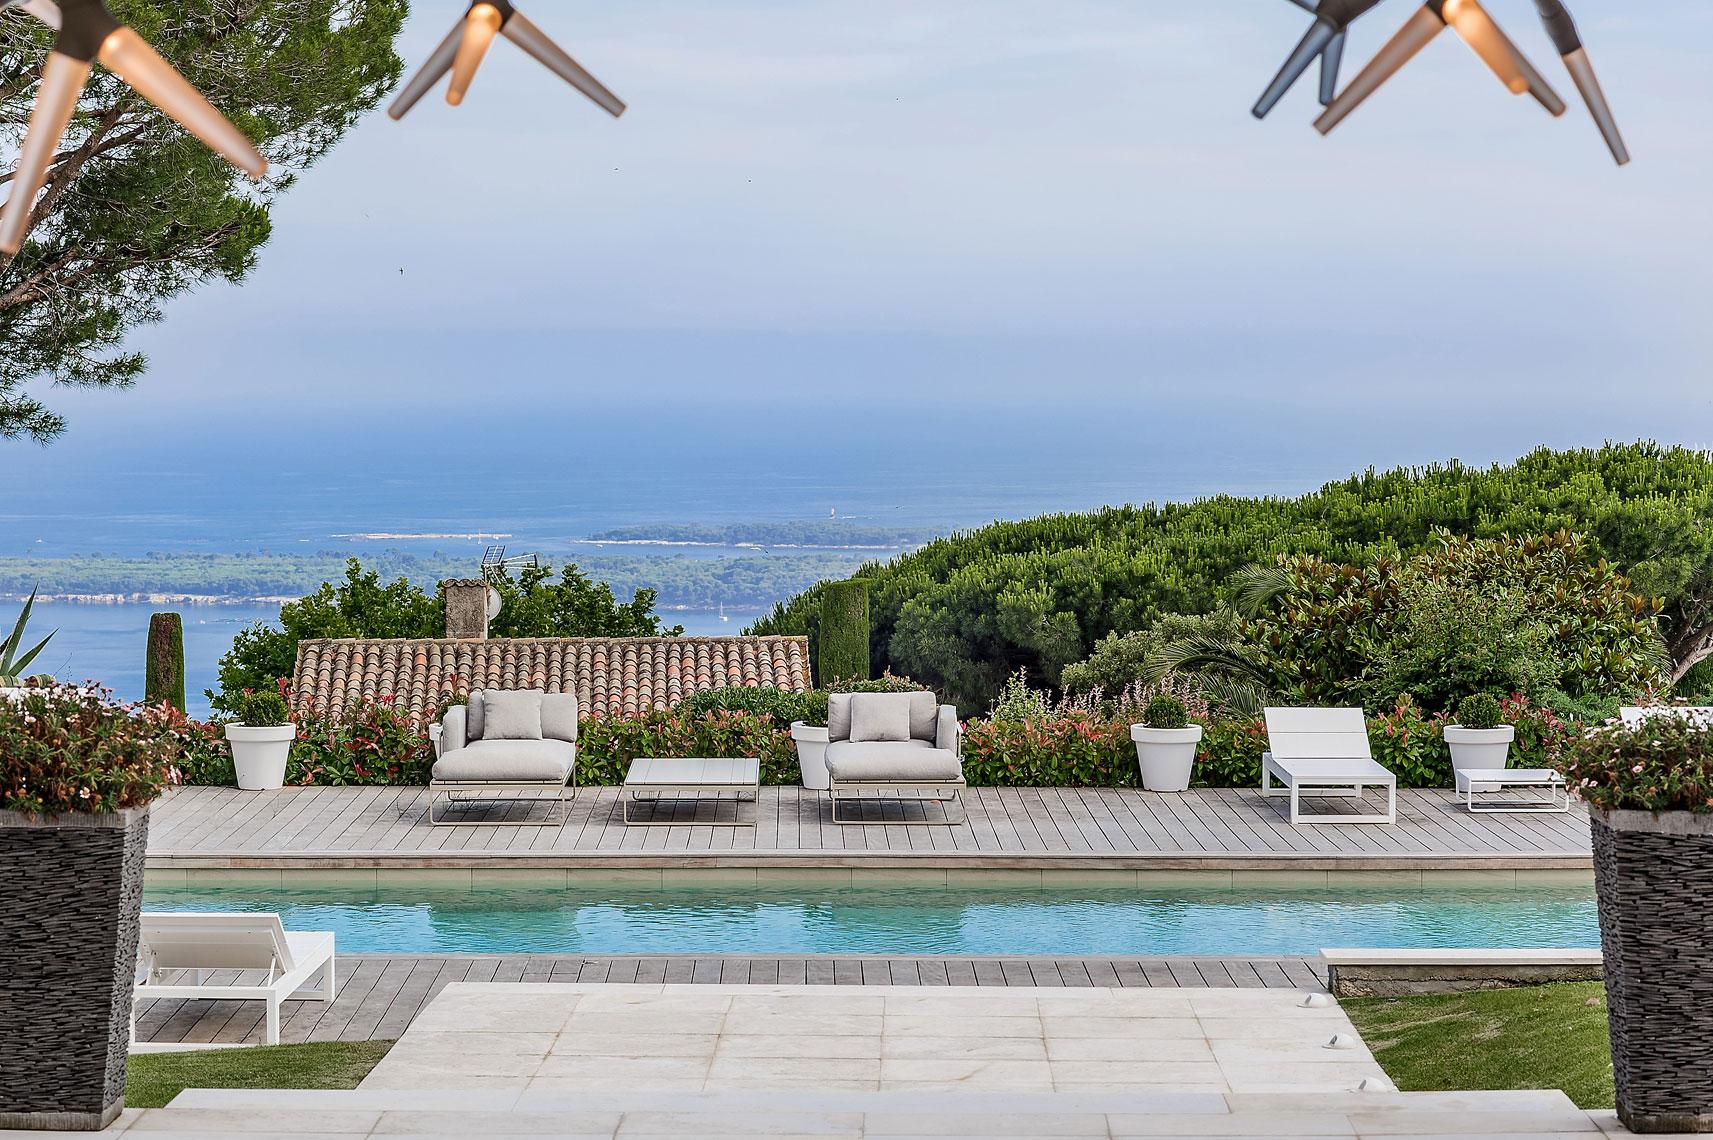 Villa-Cannes---Victor-Perez-Architecture-Photographer-04.jpg